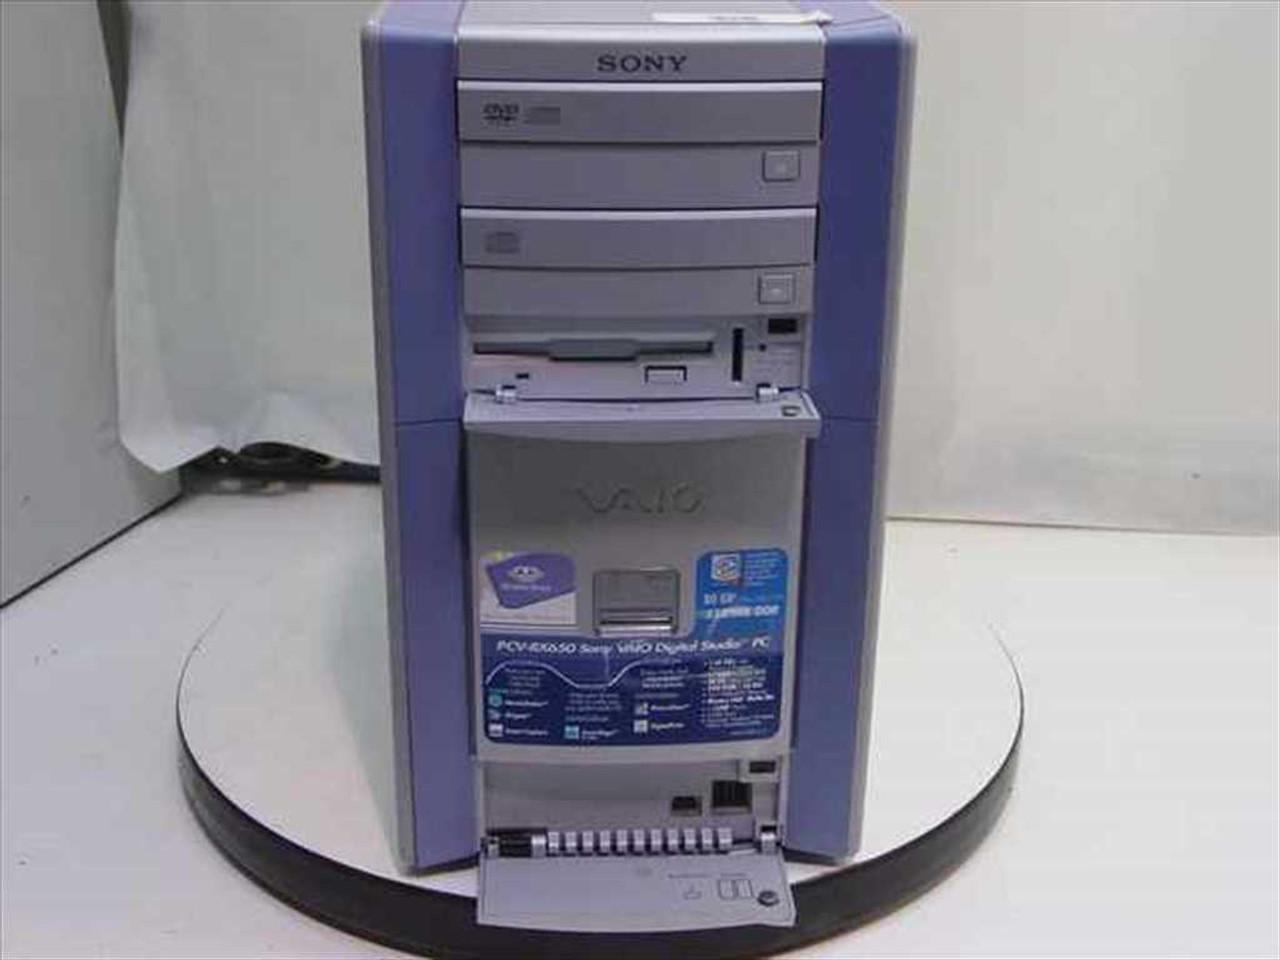 SONY VAIO PCV-RX650 DRIVER FOR WINDOWS MAC